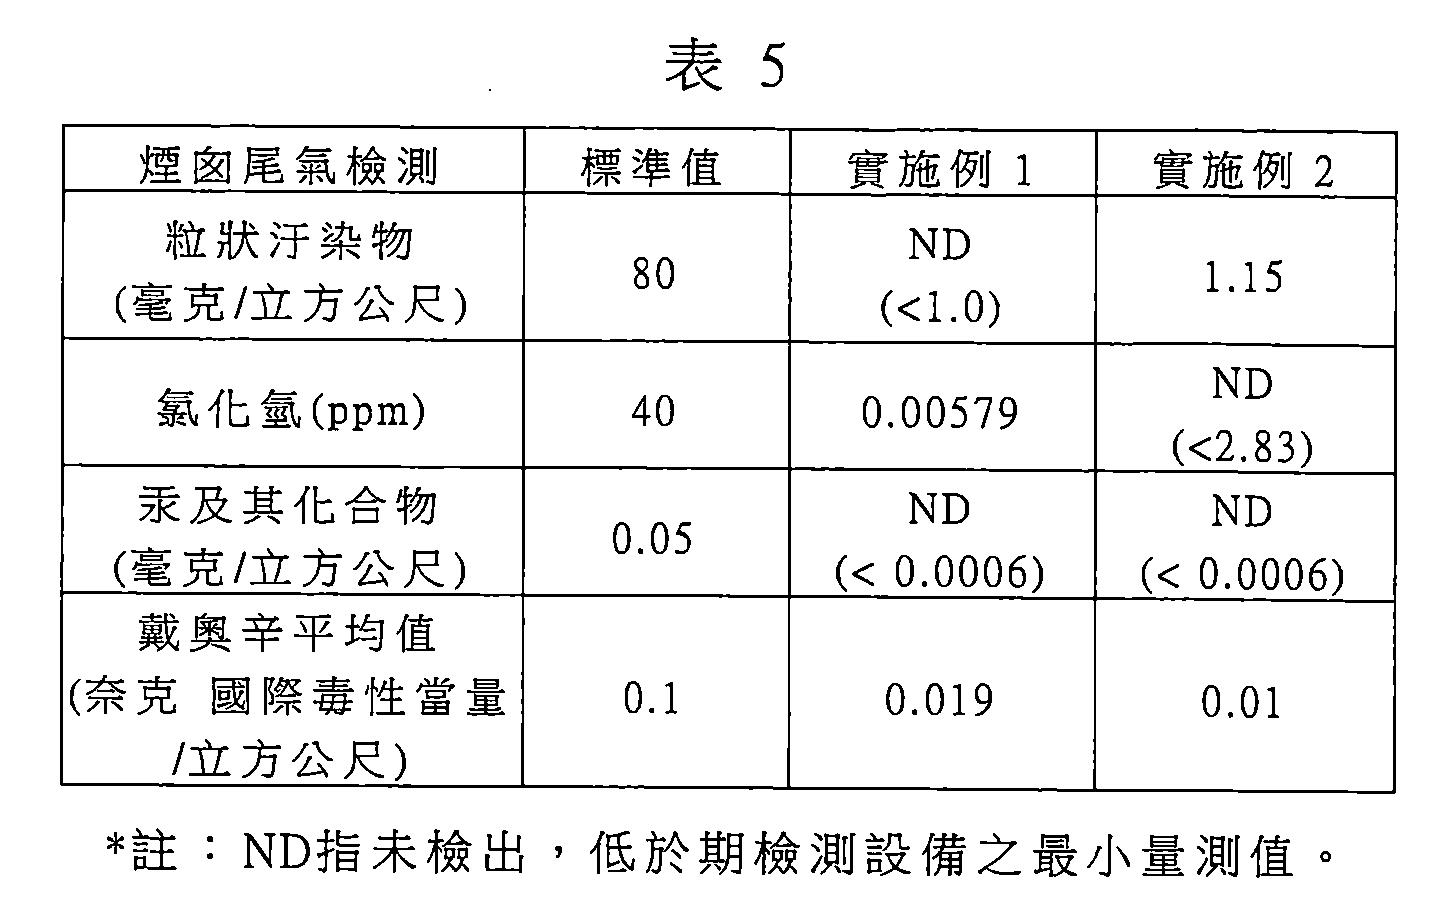 Figure 106130287-A0101-12-0014-6